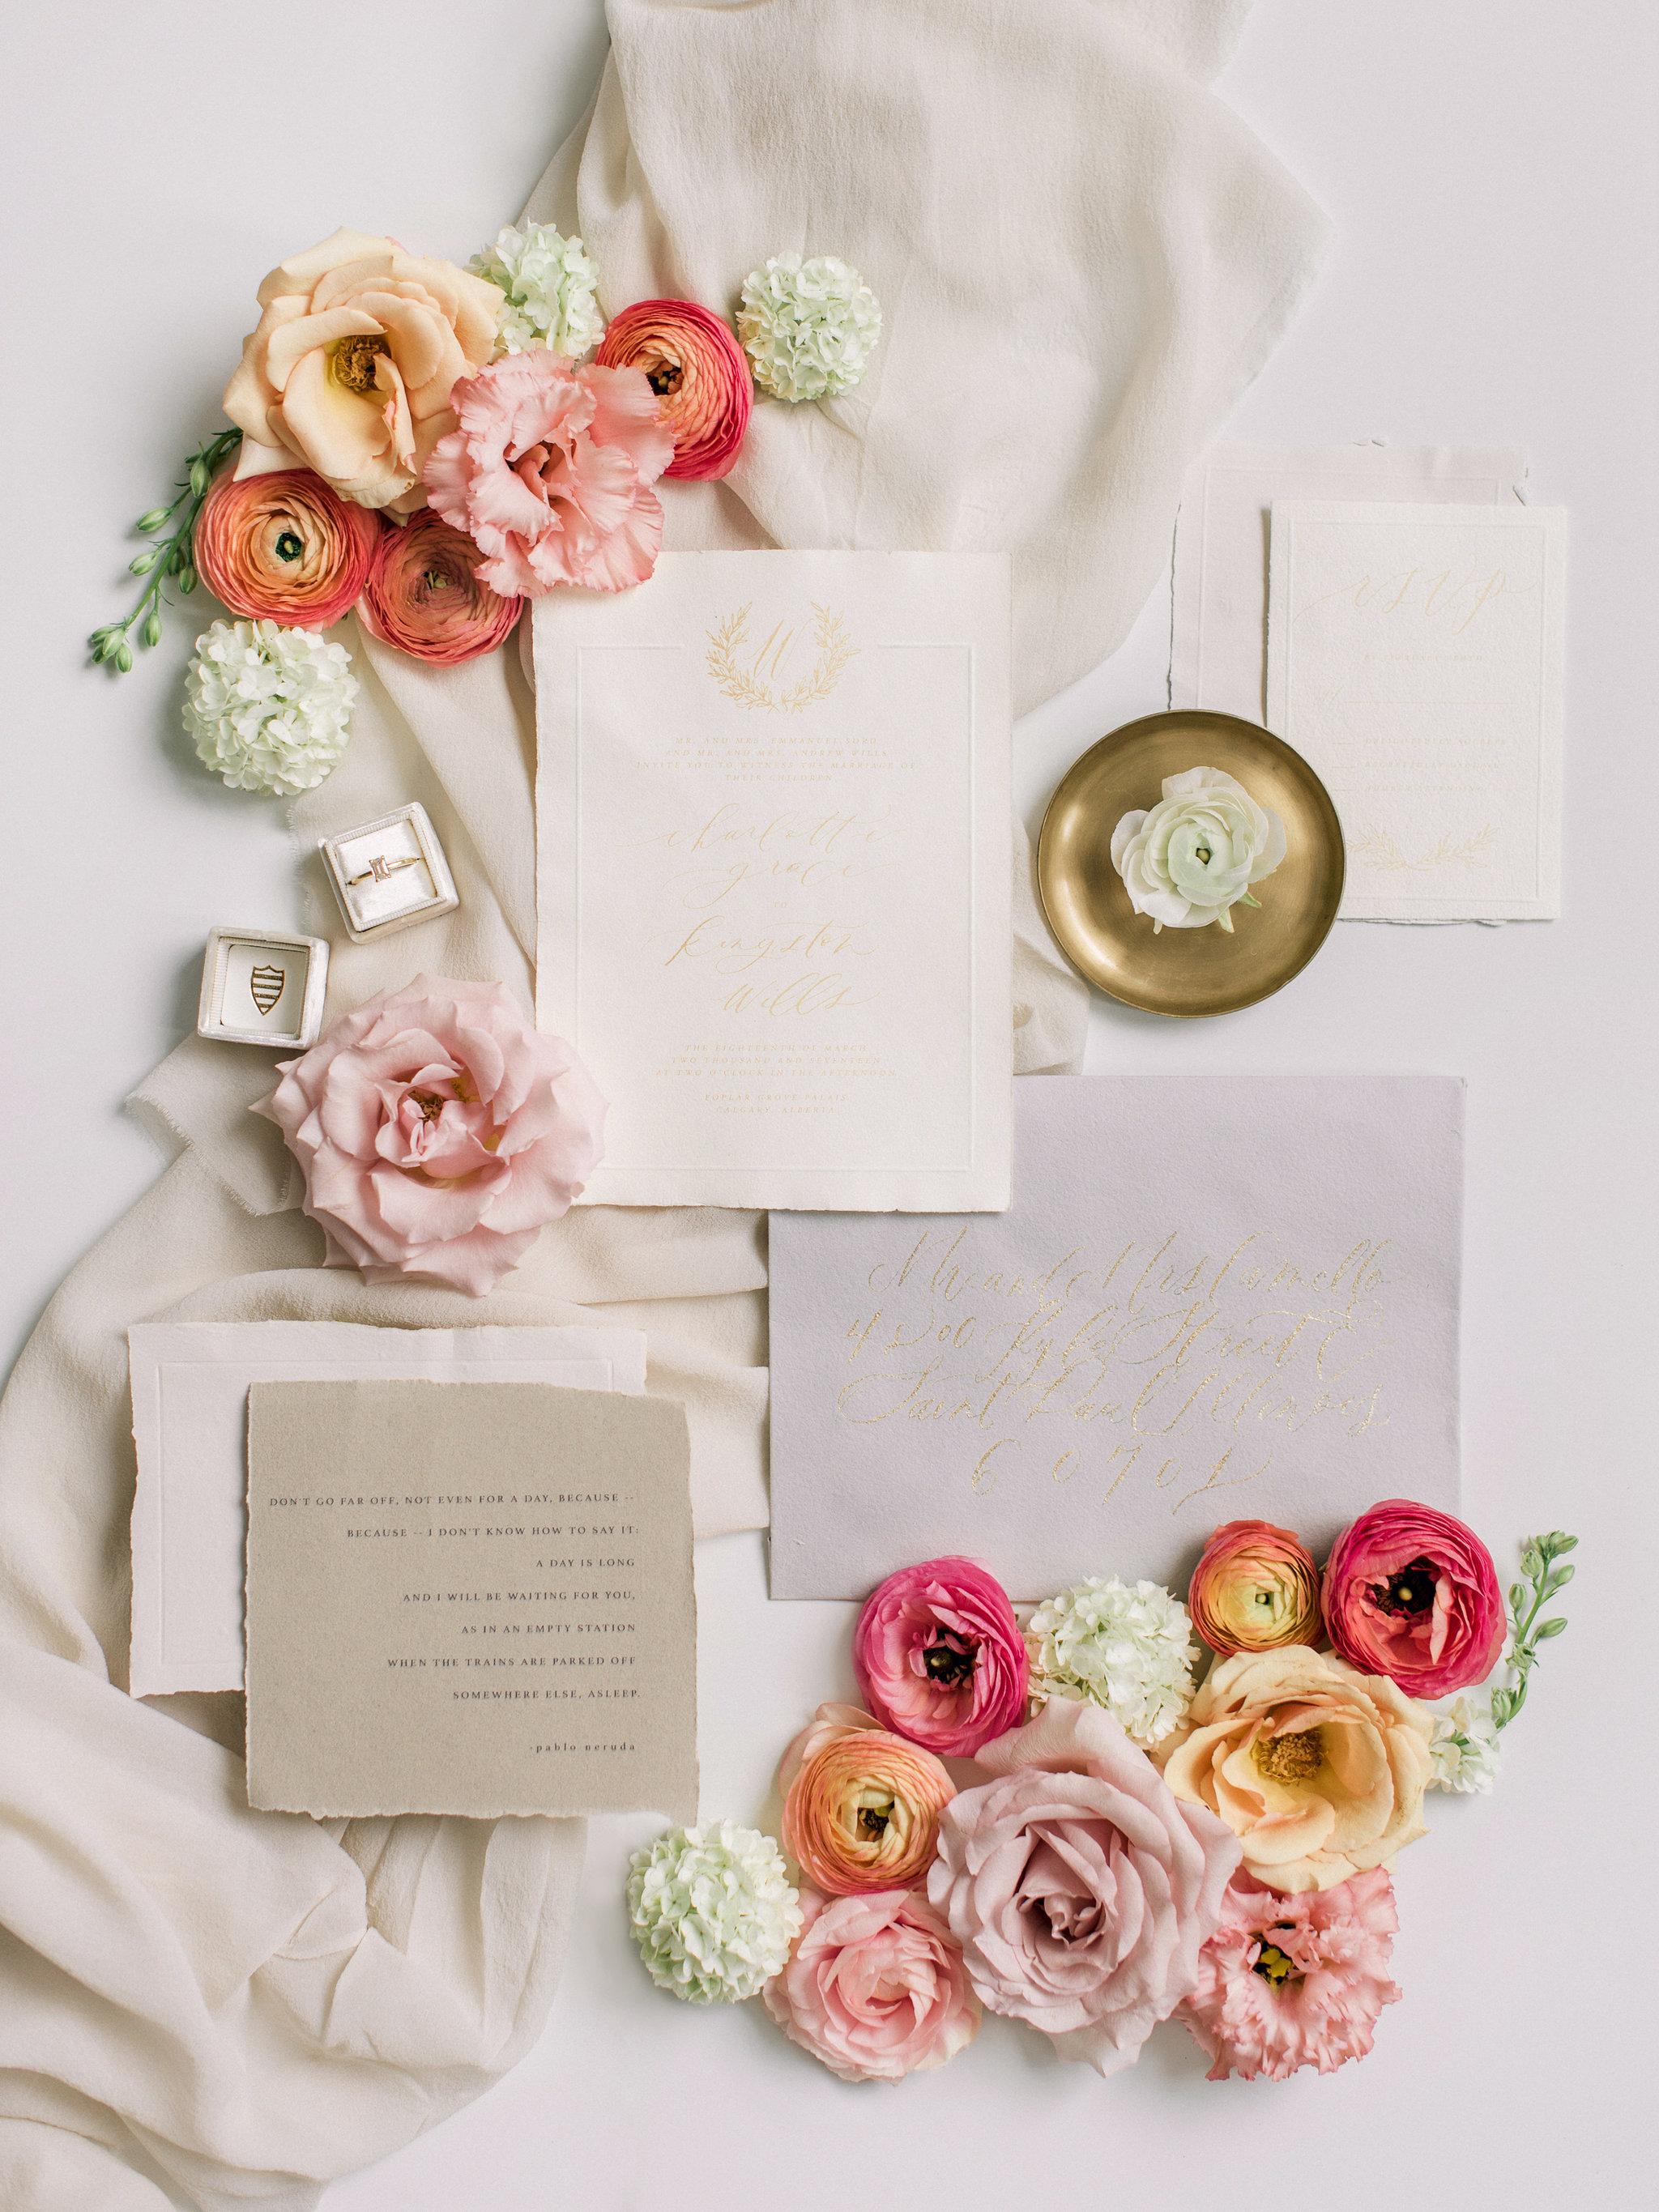 Romantic Wedding Inspiration | Spring Wedding | Summer Wedding Inspiration | Kristyn Harder Photography | Calgary Wedding Photographer | Fine Art Weddding Blog | Joy Wed